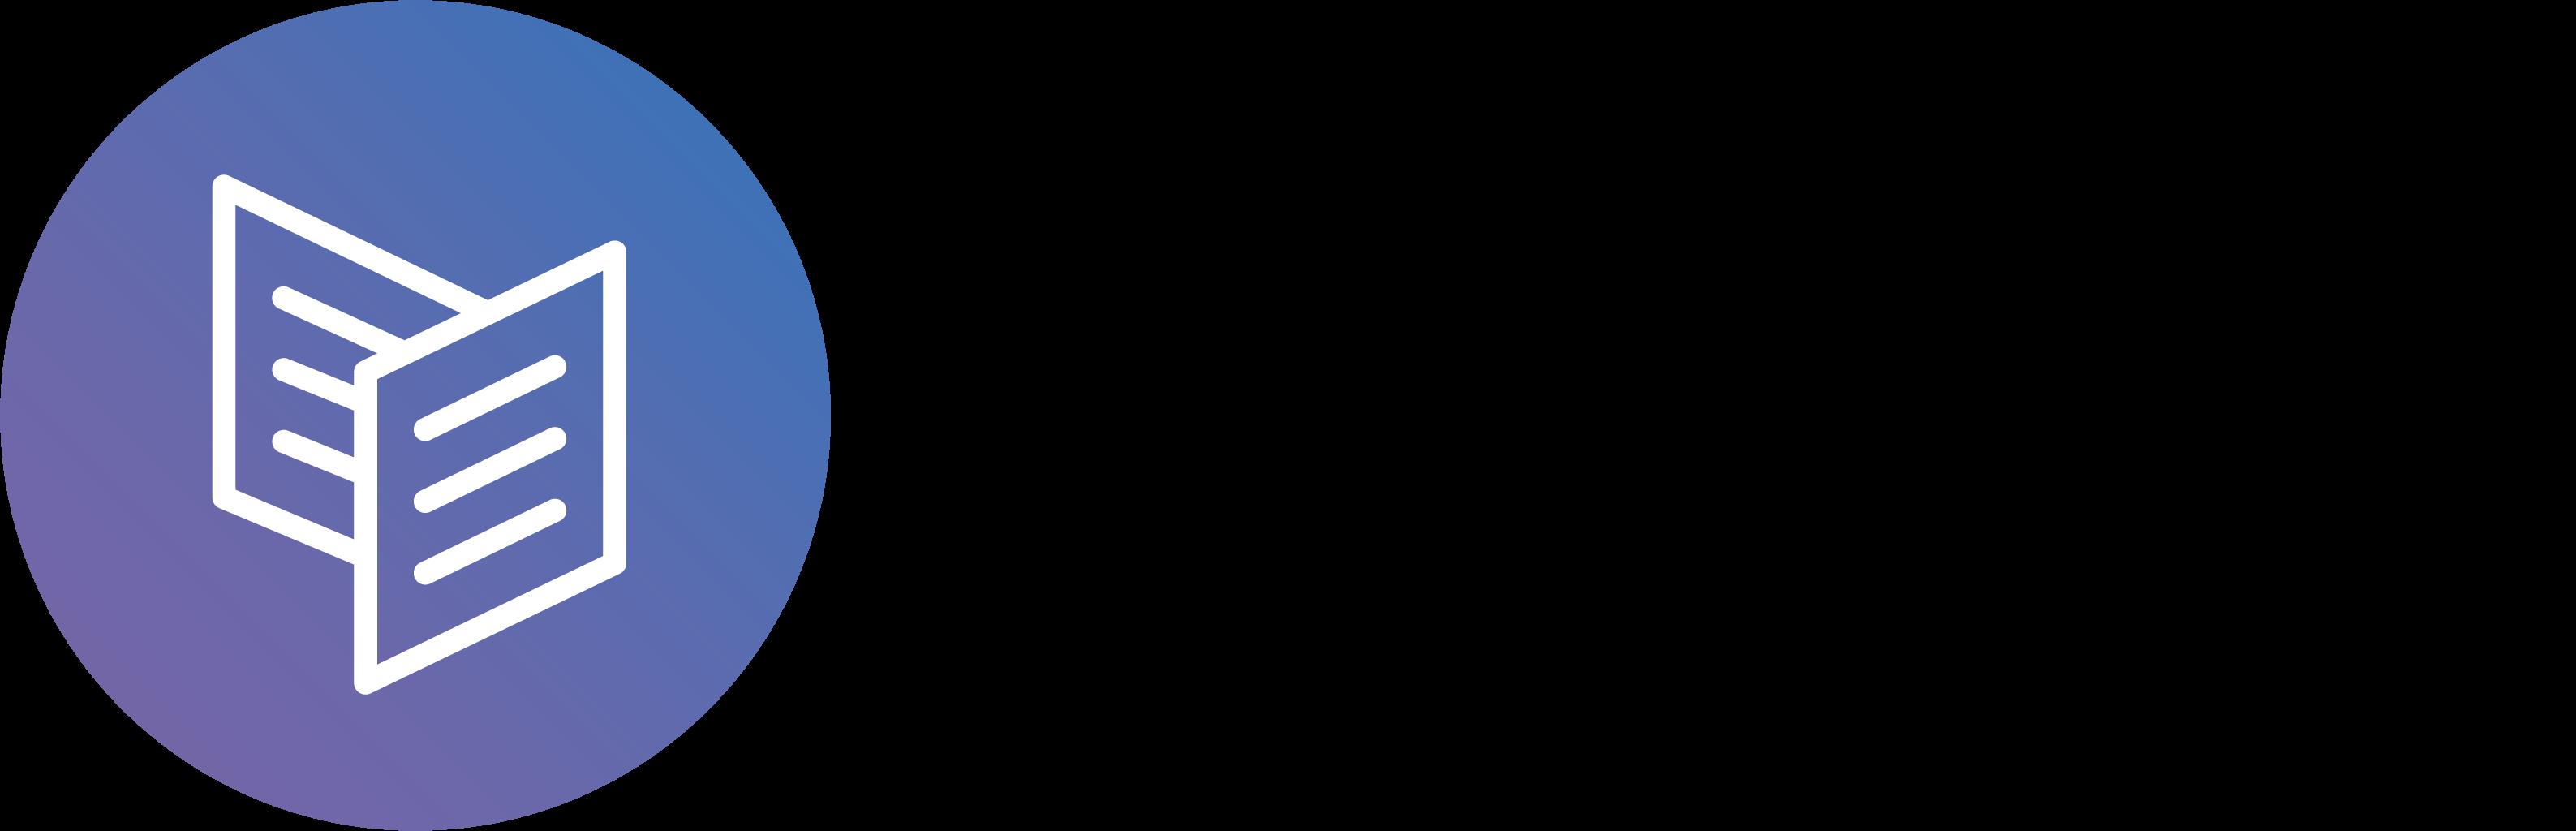 Carrd logo